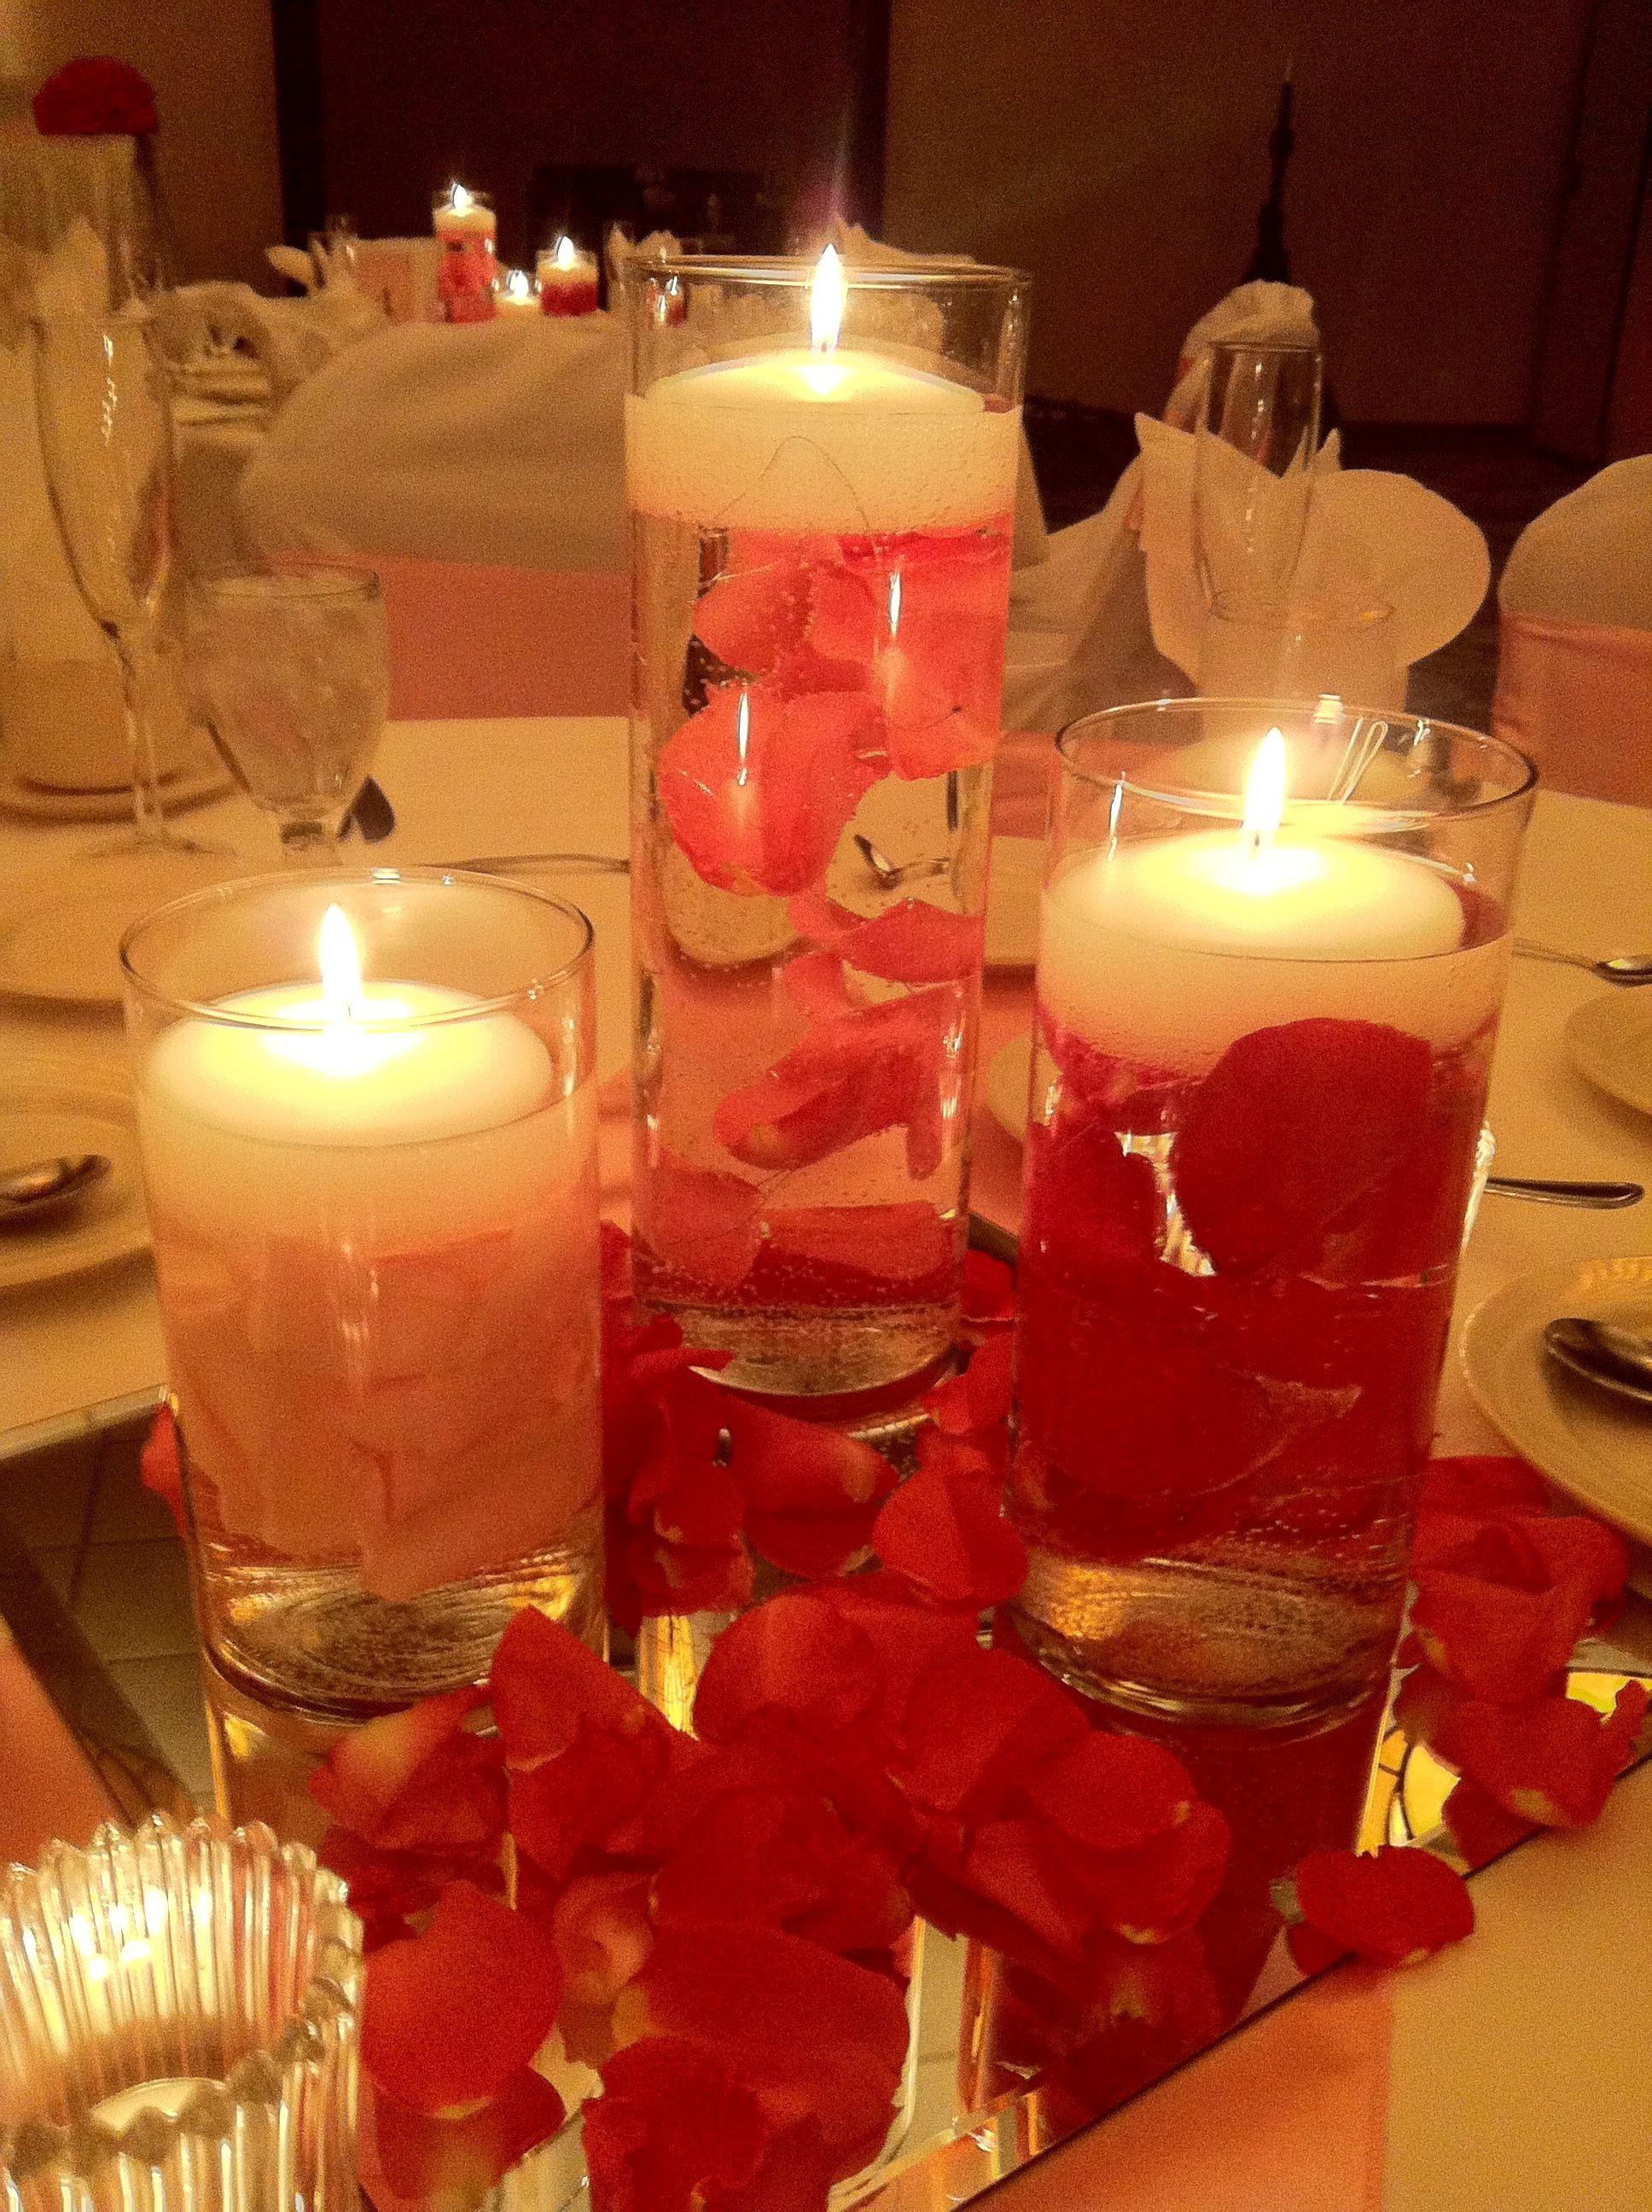 candy flower vase of wedding home decoration ideas fresh living room vases wedding regarding wedding home decoration ideas luxury decoration 1 an genial 42 unique house decor ideas image of